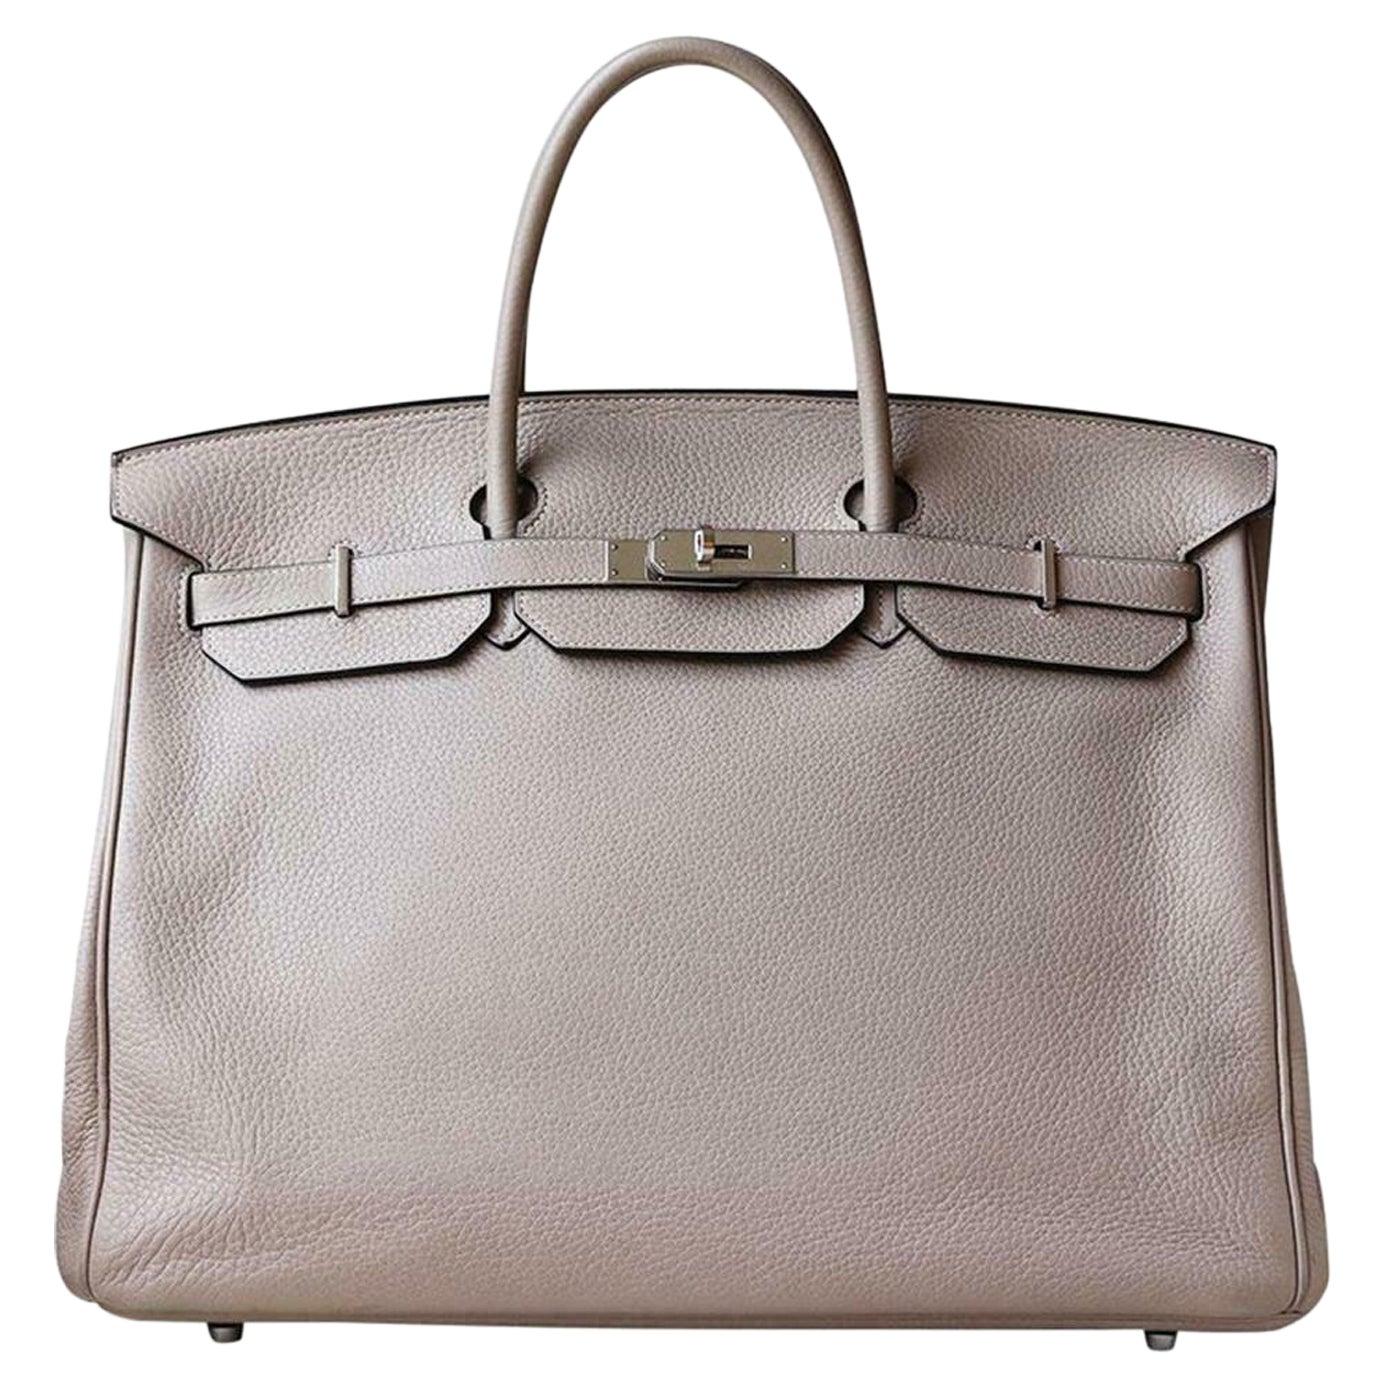 Hermès 40CM Clemence Palladium H/W Birkin Bag